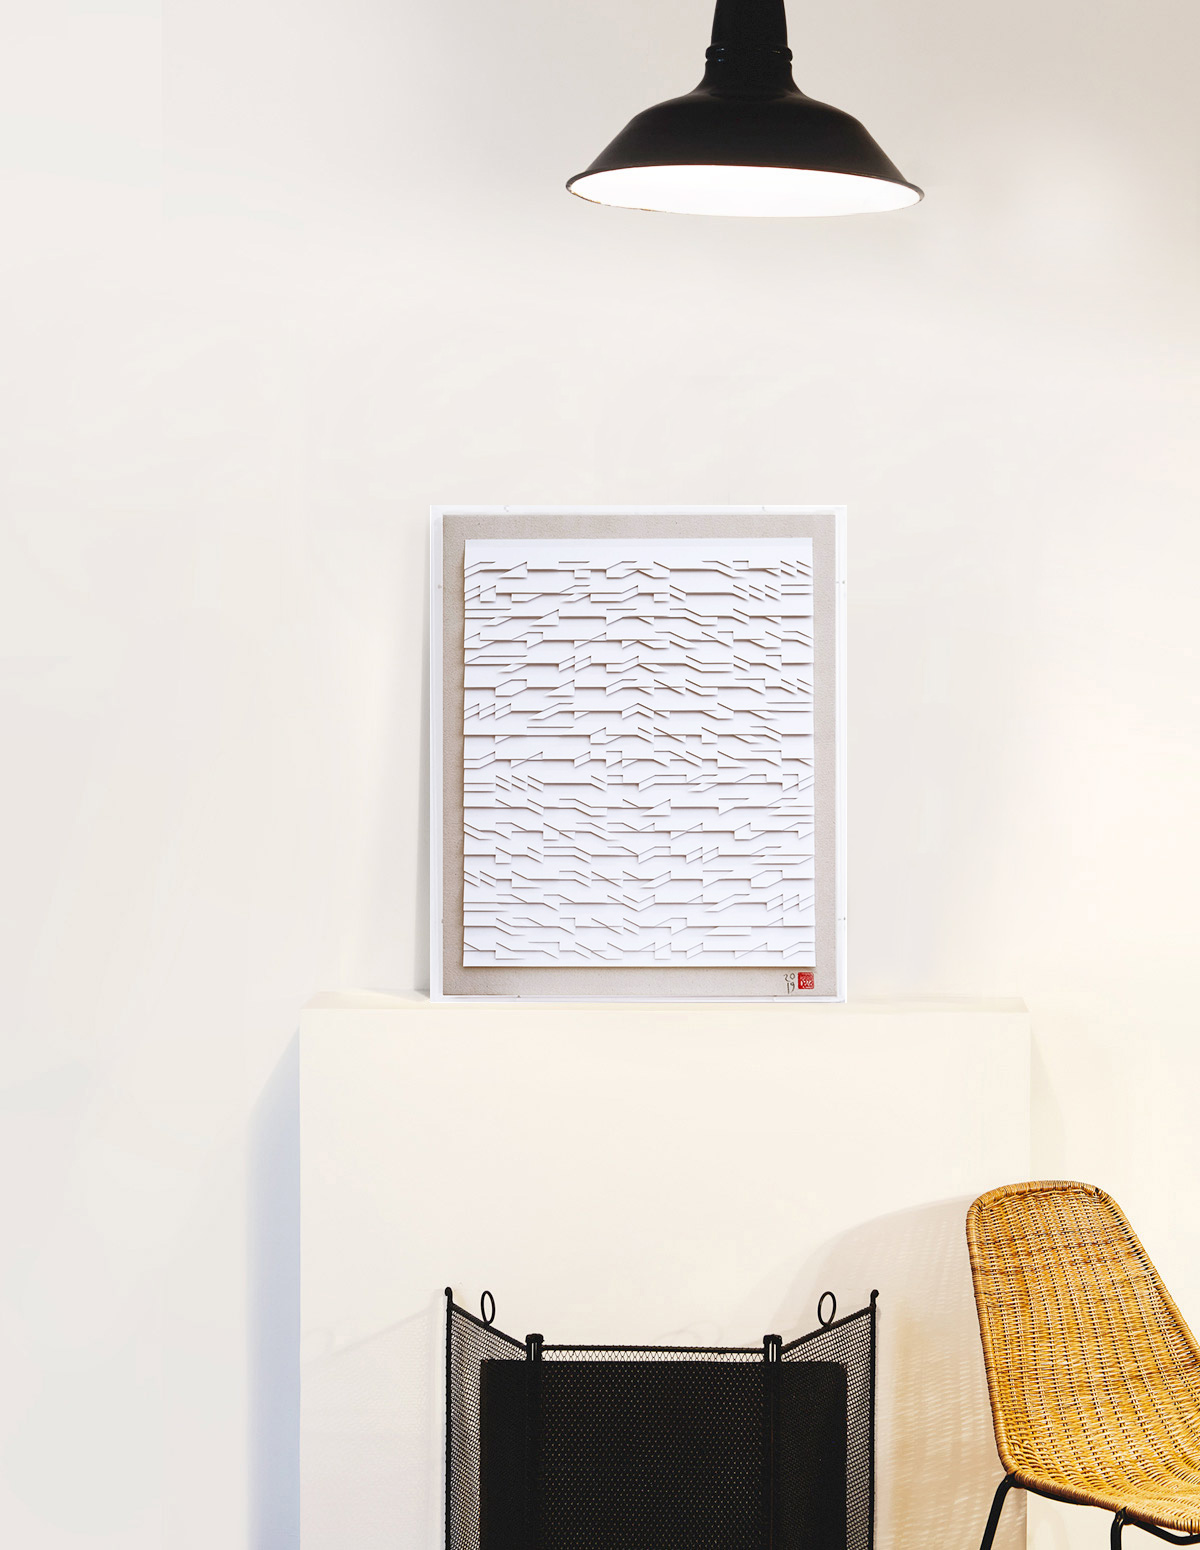 Fernando Daza - Oeuvre sur papier - Monochrome Basik 4